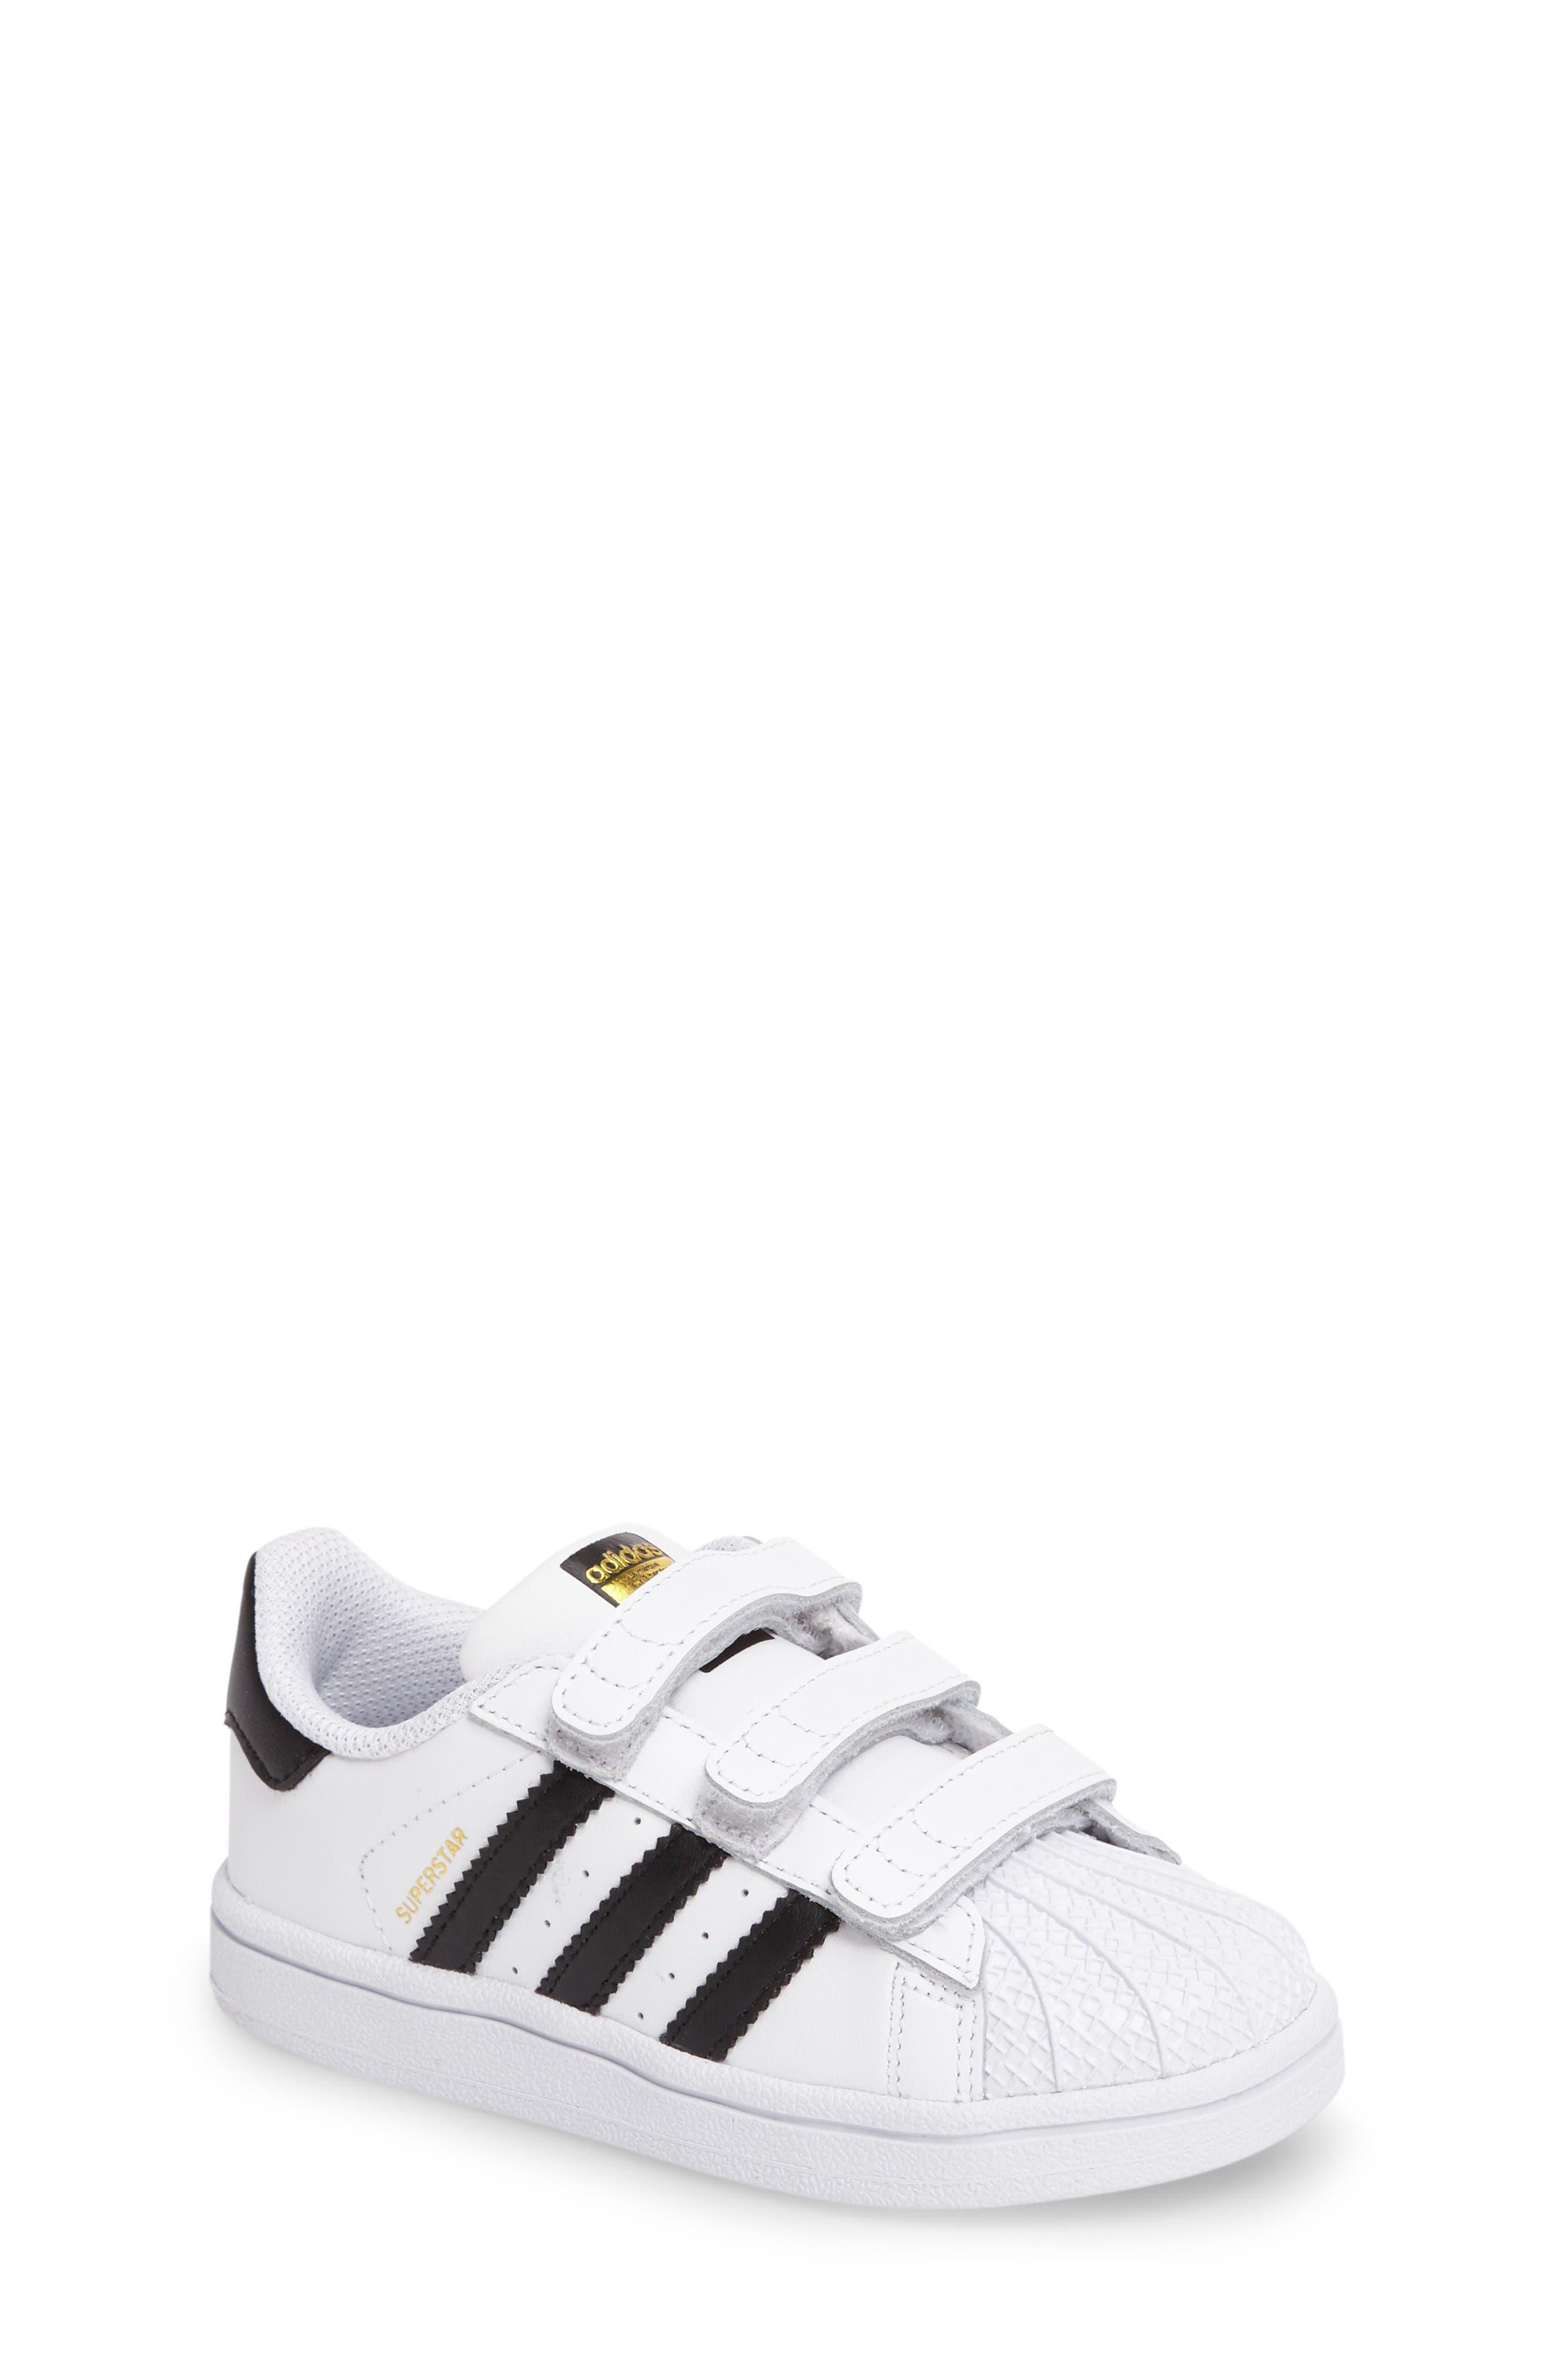 Superstar Foundation Sneaker,                             Main thumbnail 1, color,                             White/ Core Black/ White